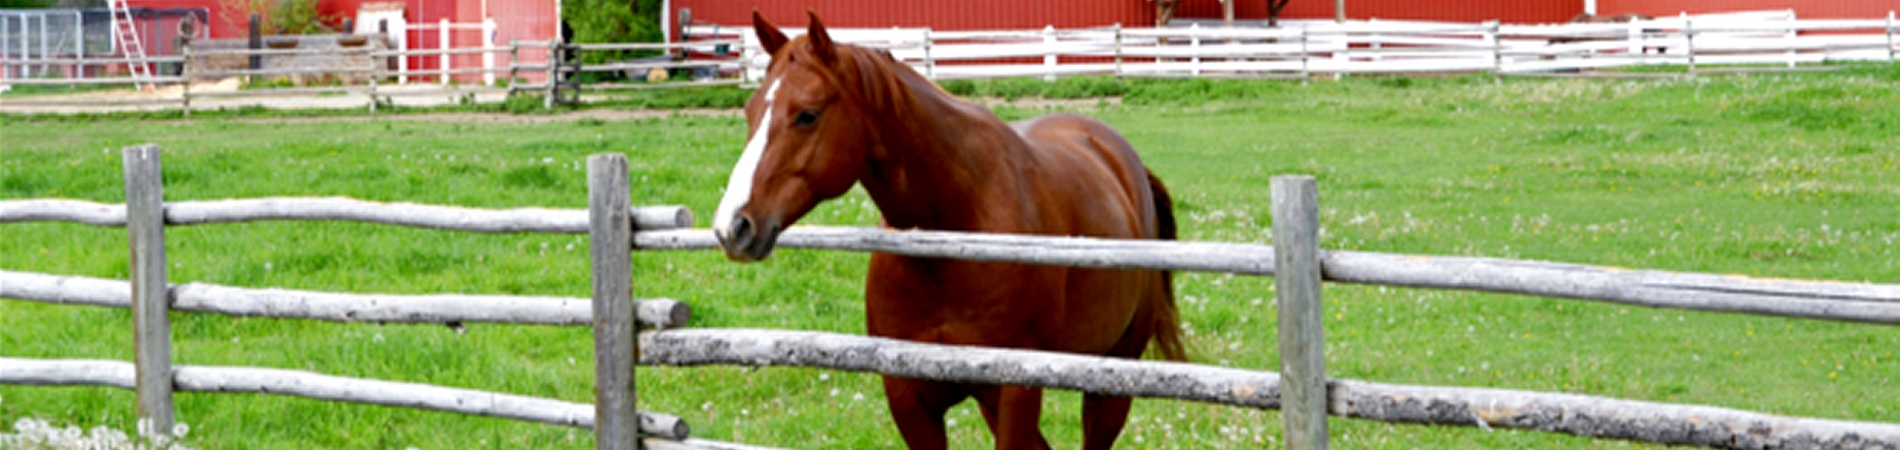 HorseRailFence